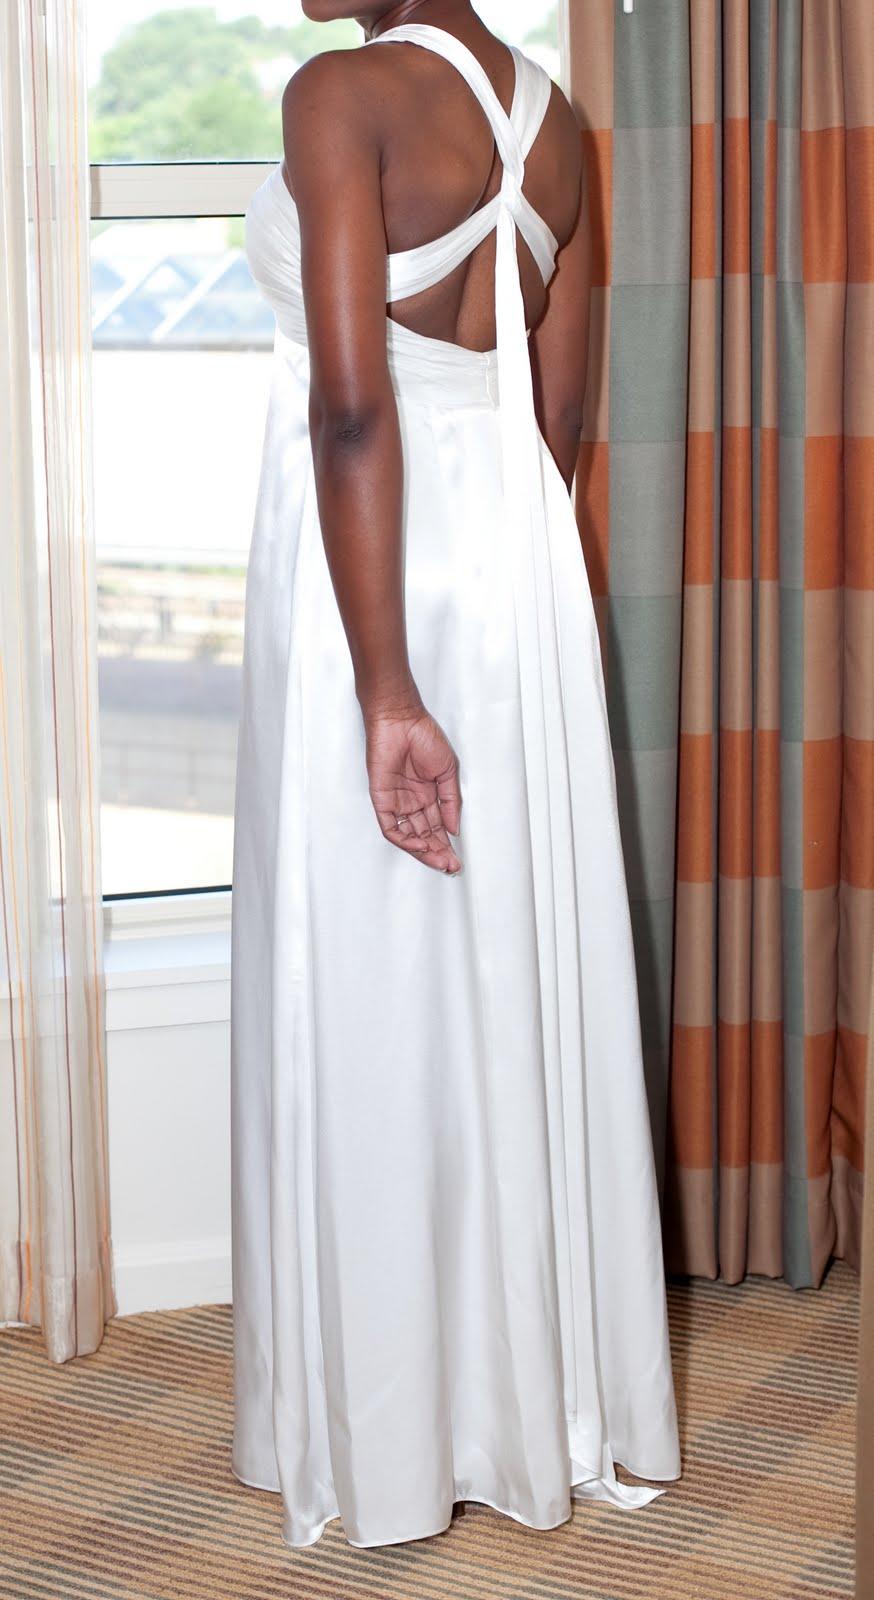 2000 Dollar Budget Wedding: Dress Giveaway!